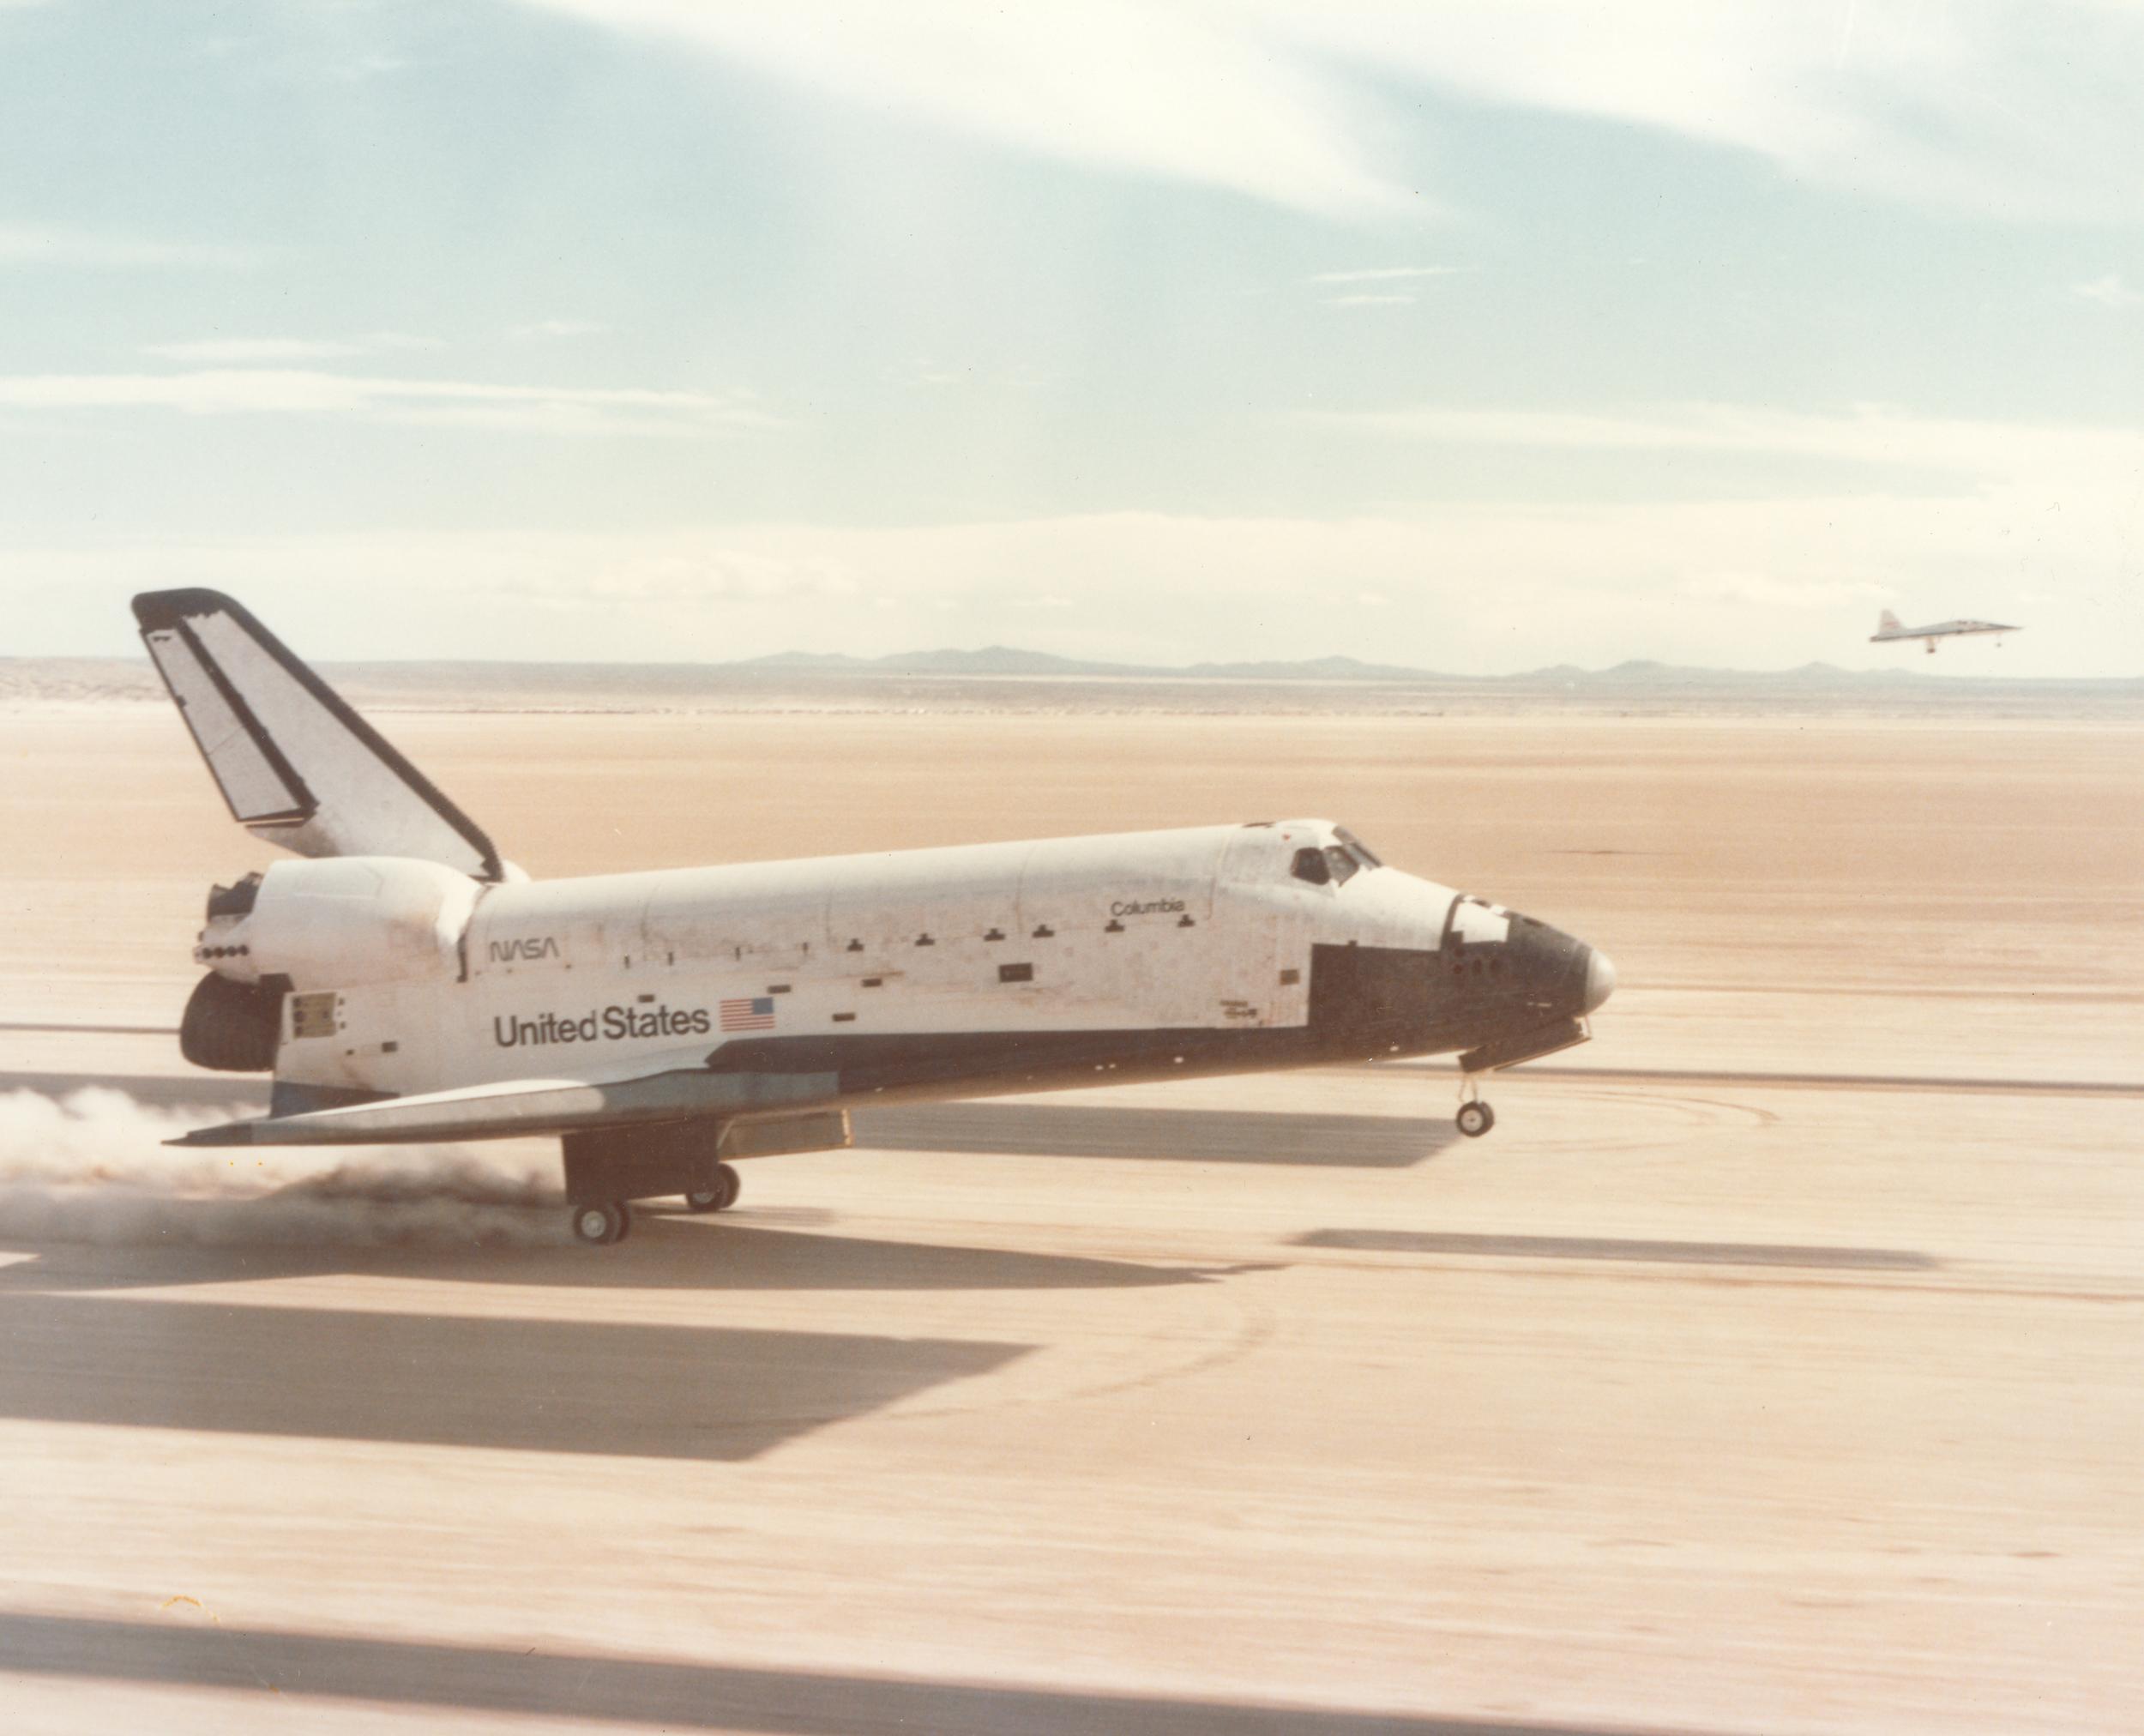 Shuttle Columbia landing quality image 600dpi.jpg